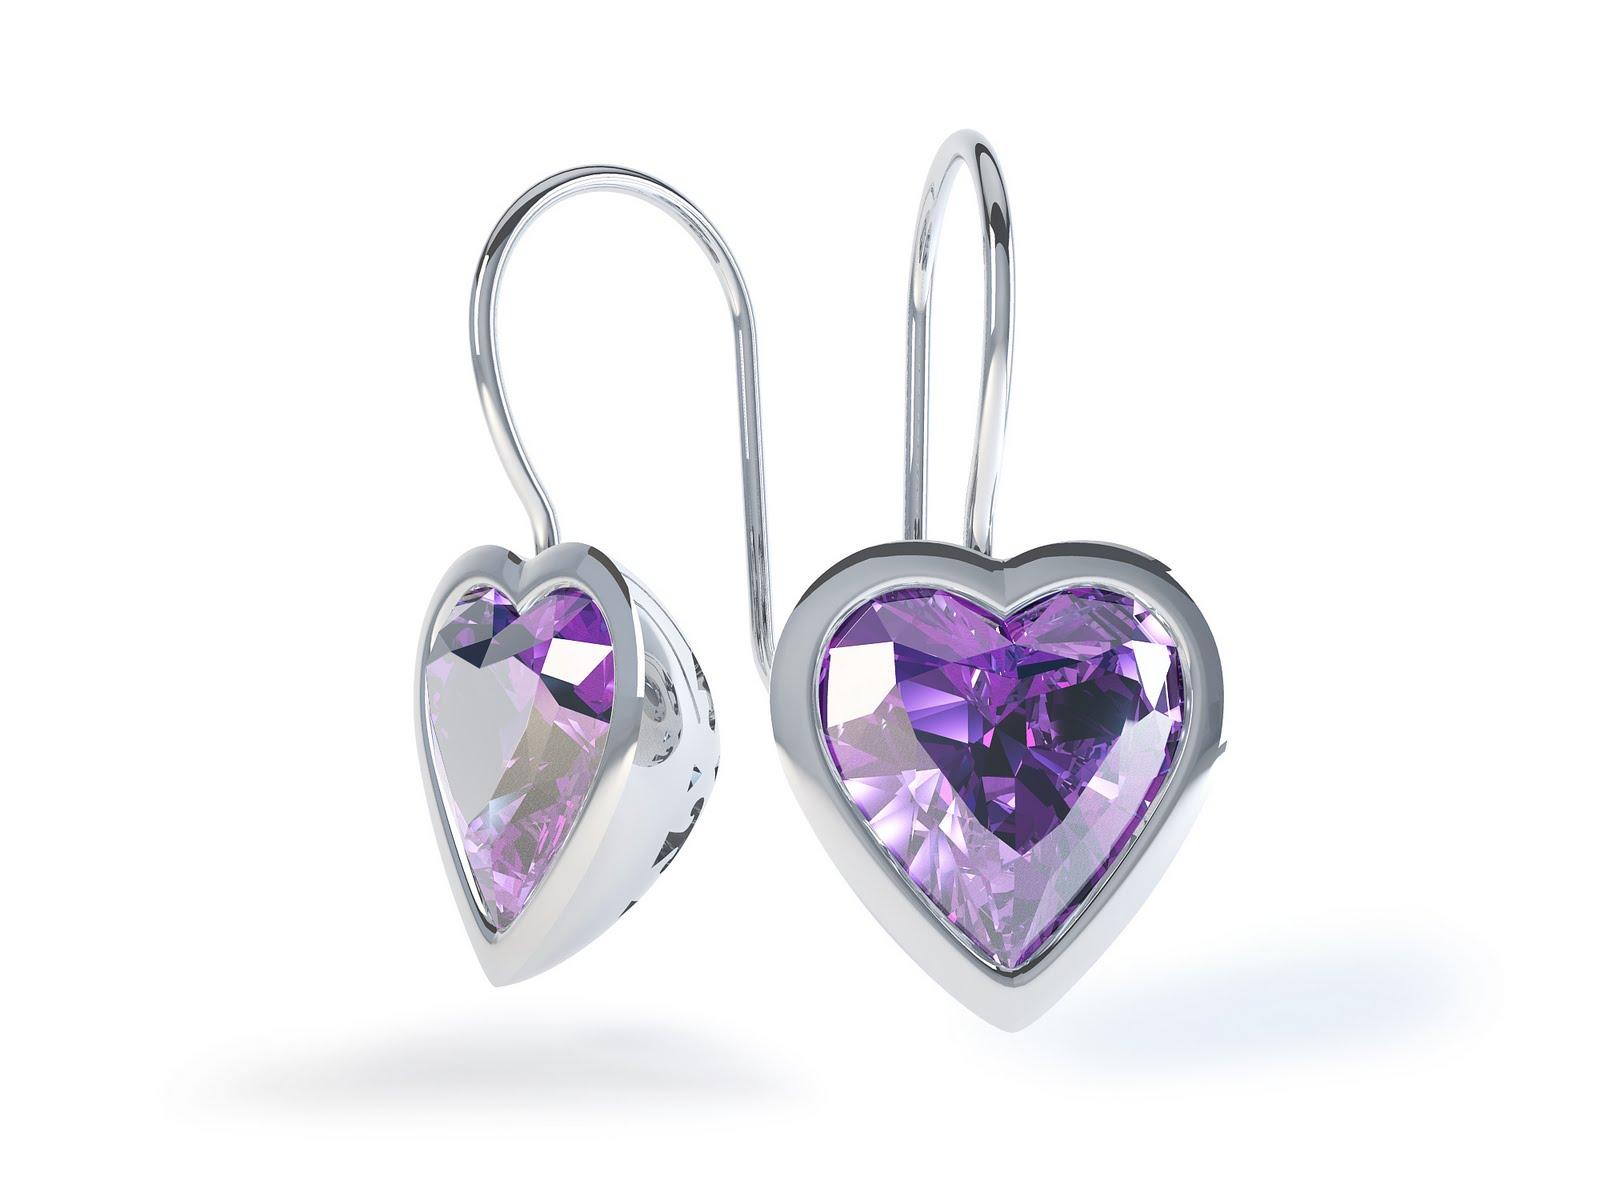 http://4.bp.blogspot.com/-erF6AnsEdRM/Tmeq5rm7PXI/AAAAAAAAAS8/4gtSncJHivE/s1600/31_1_earrings_amethyst.jpg